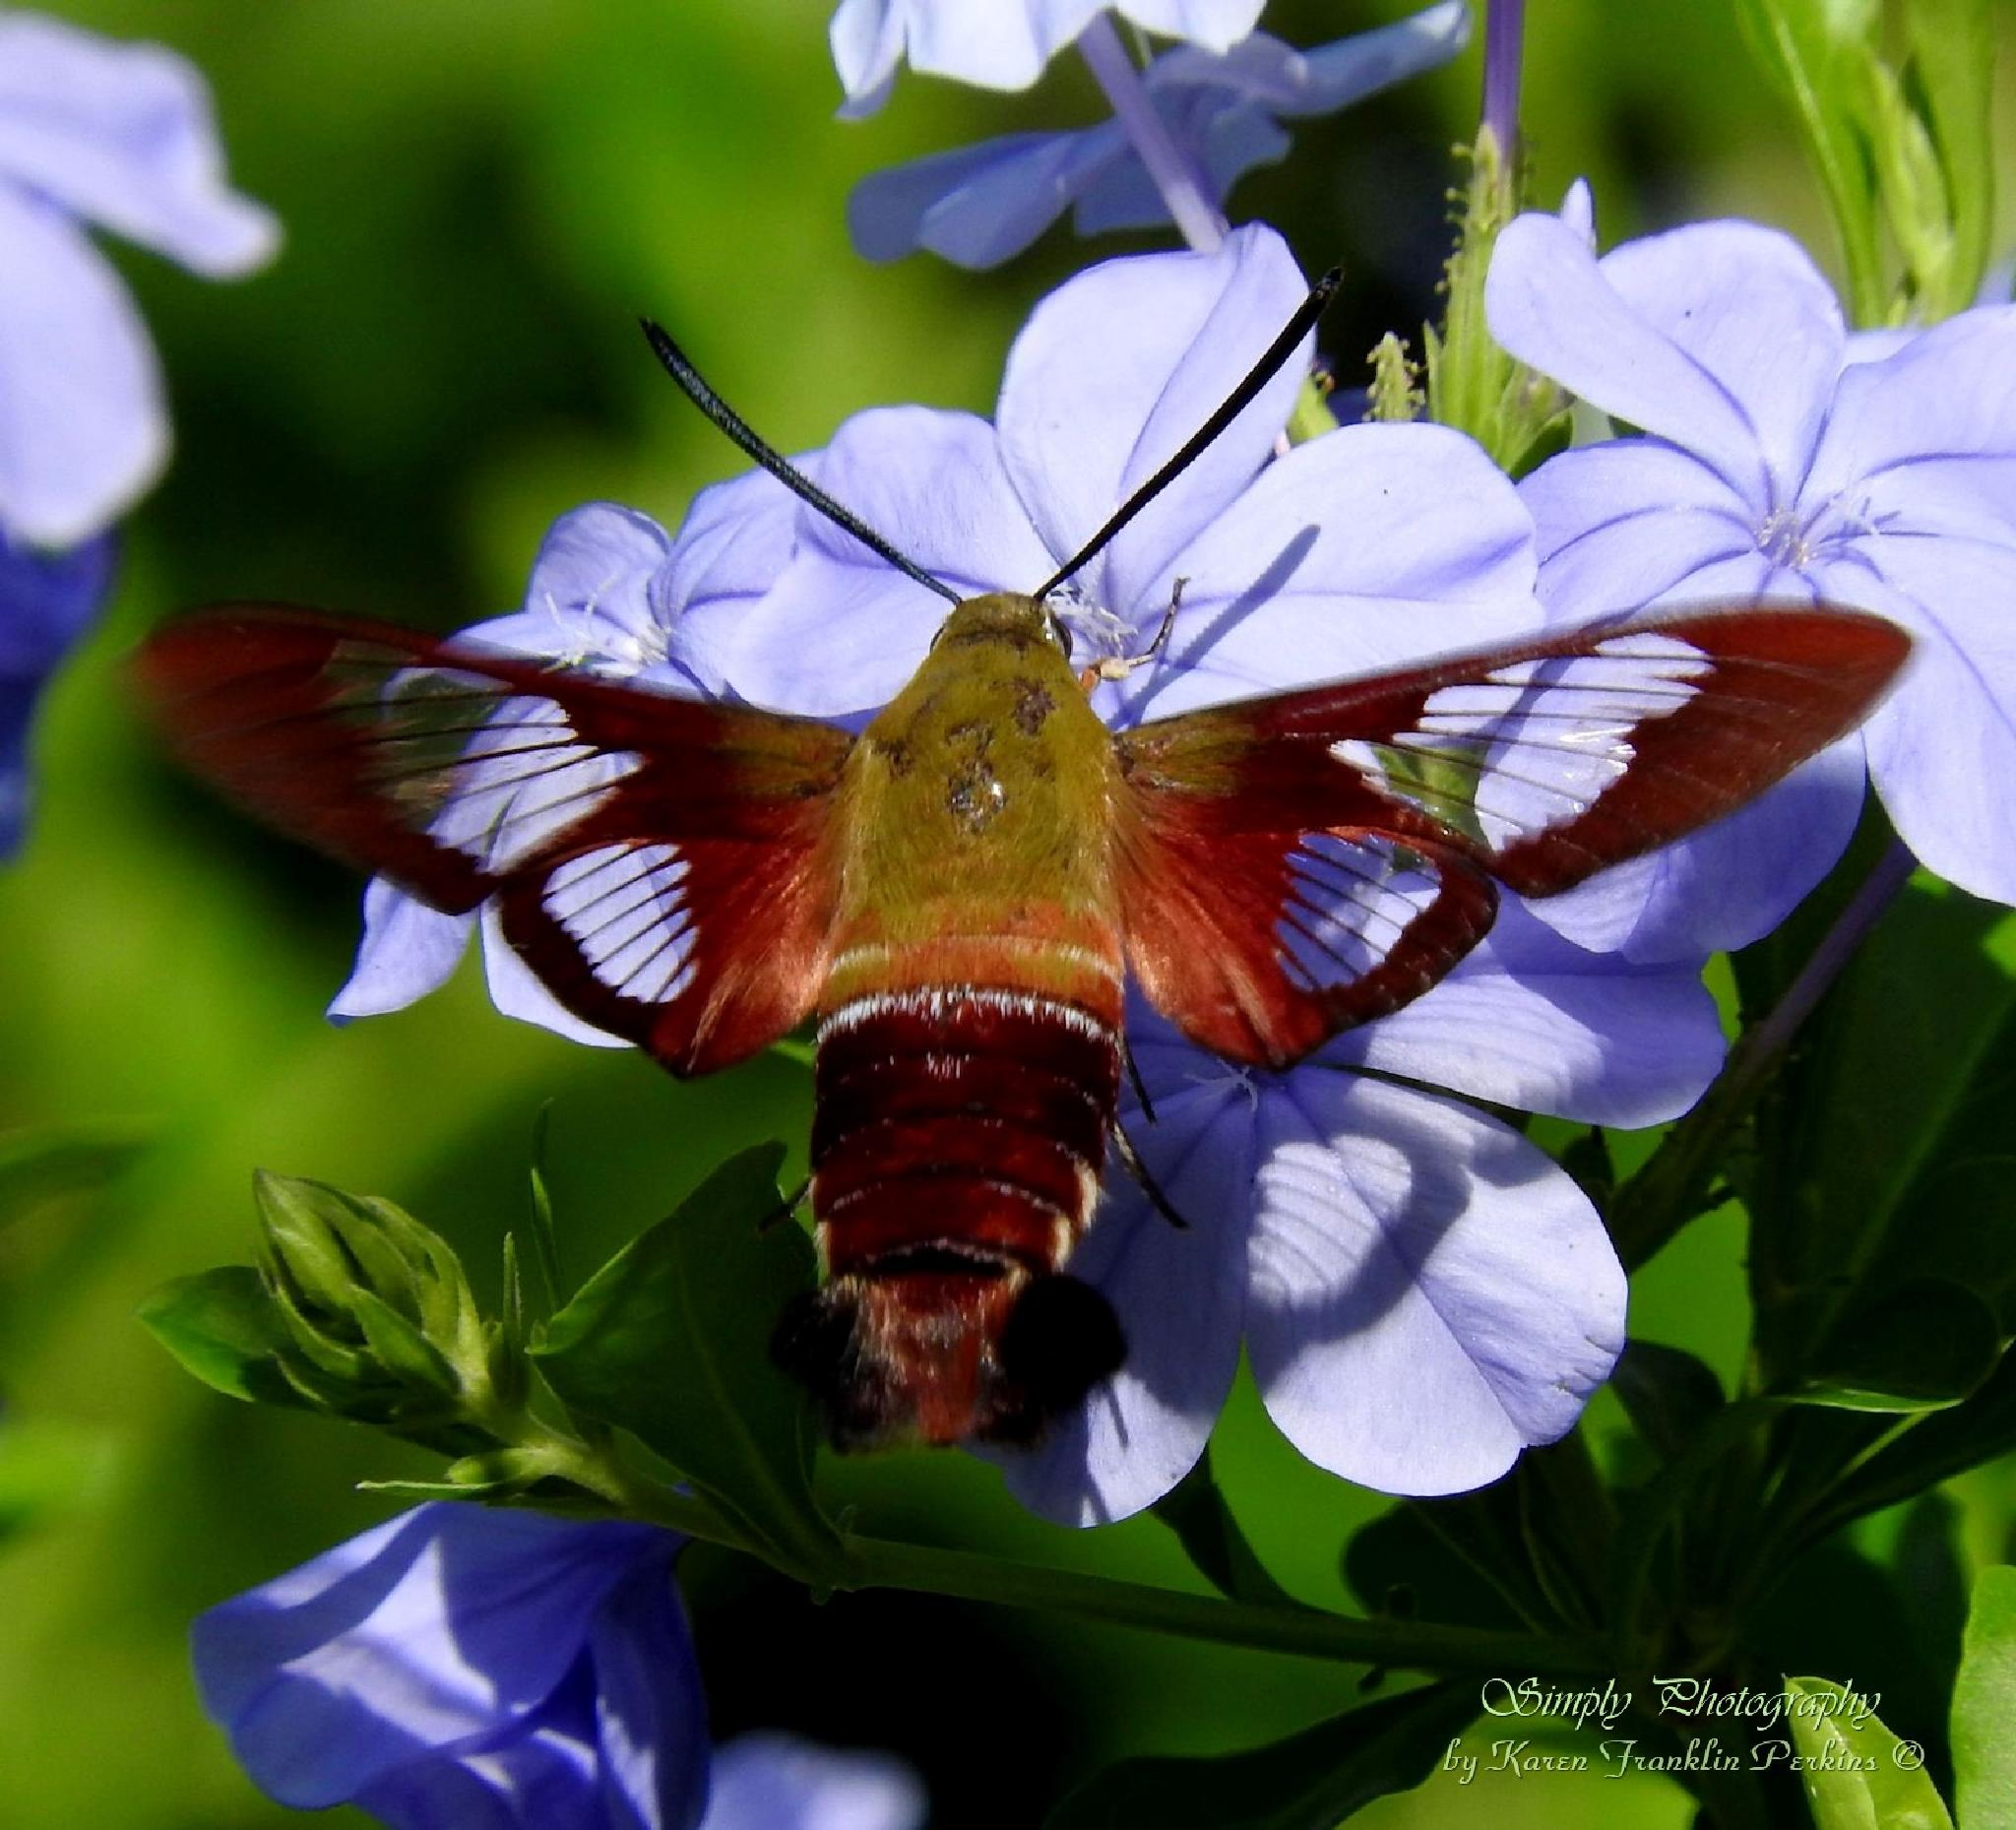 Clearwing Hummingbird Moth by Karen Franklin Perkins